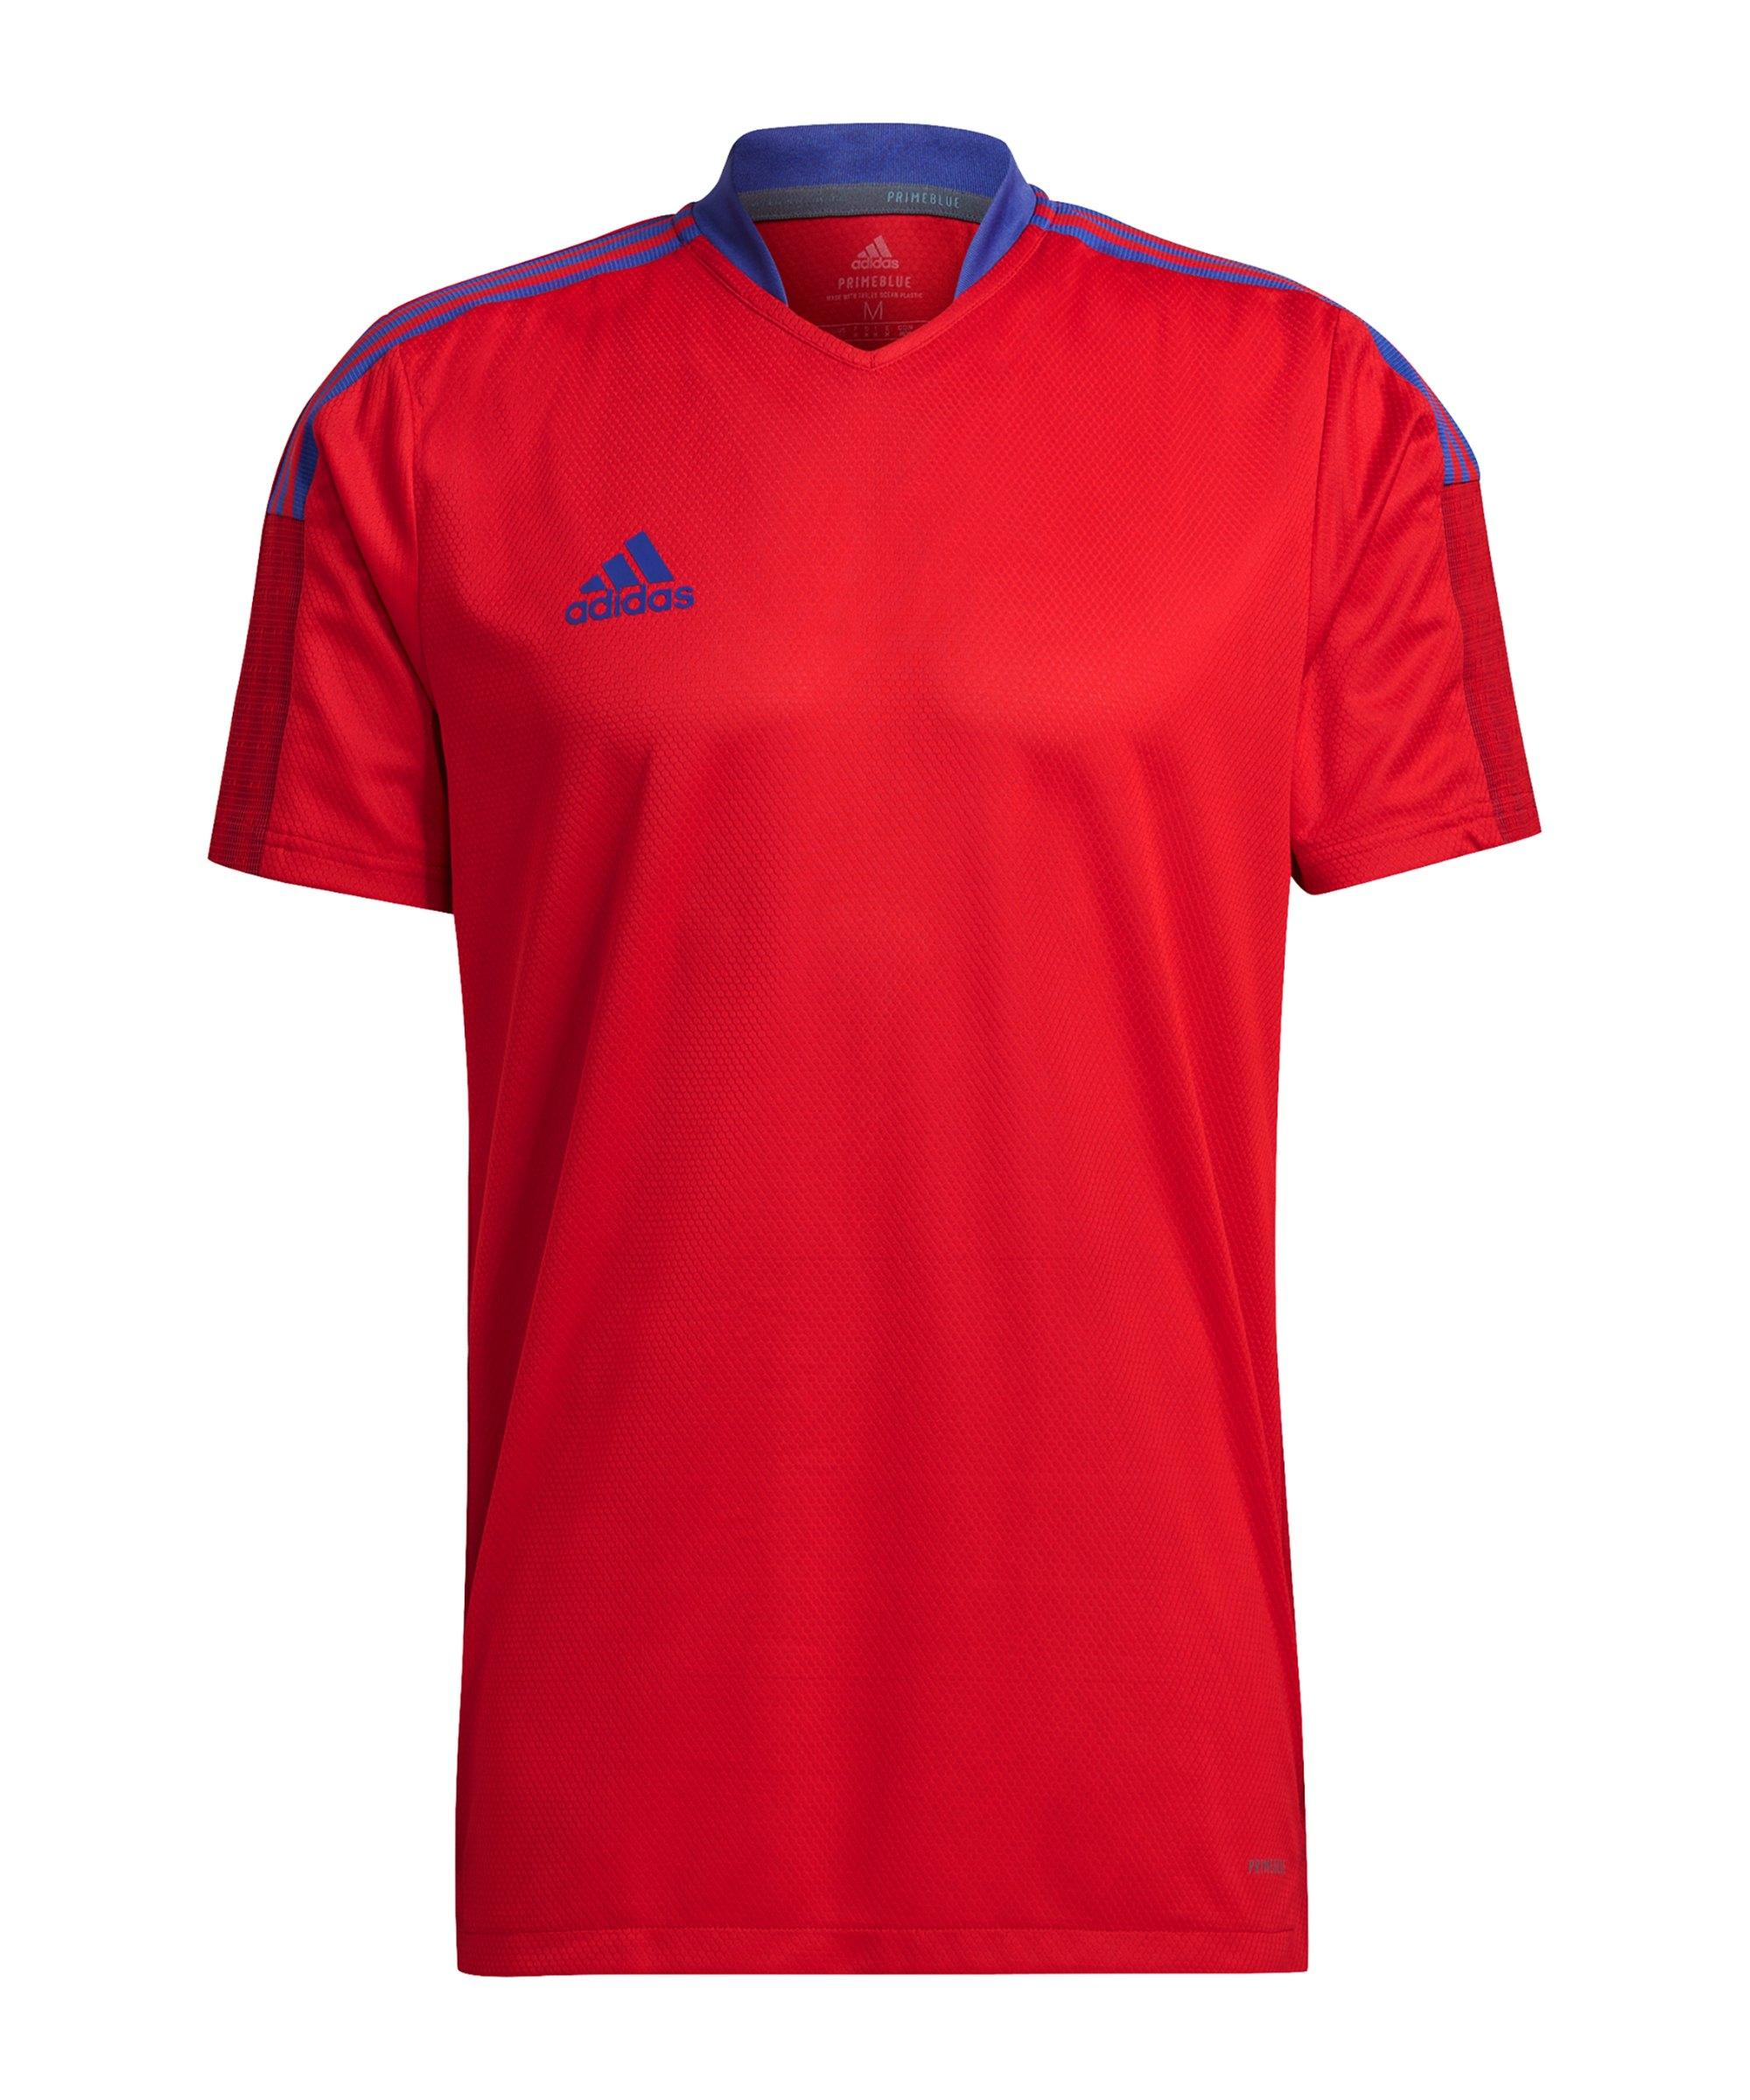 adidas Tiro Primeblue Trikot Training Rot Blau - rot